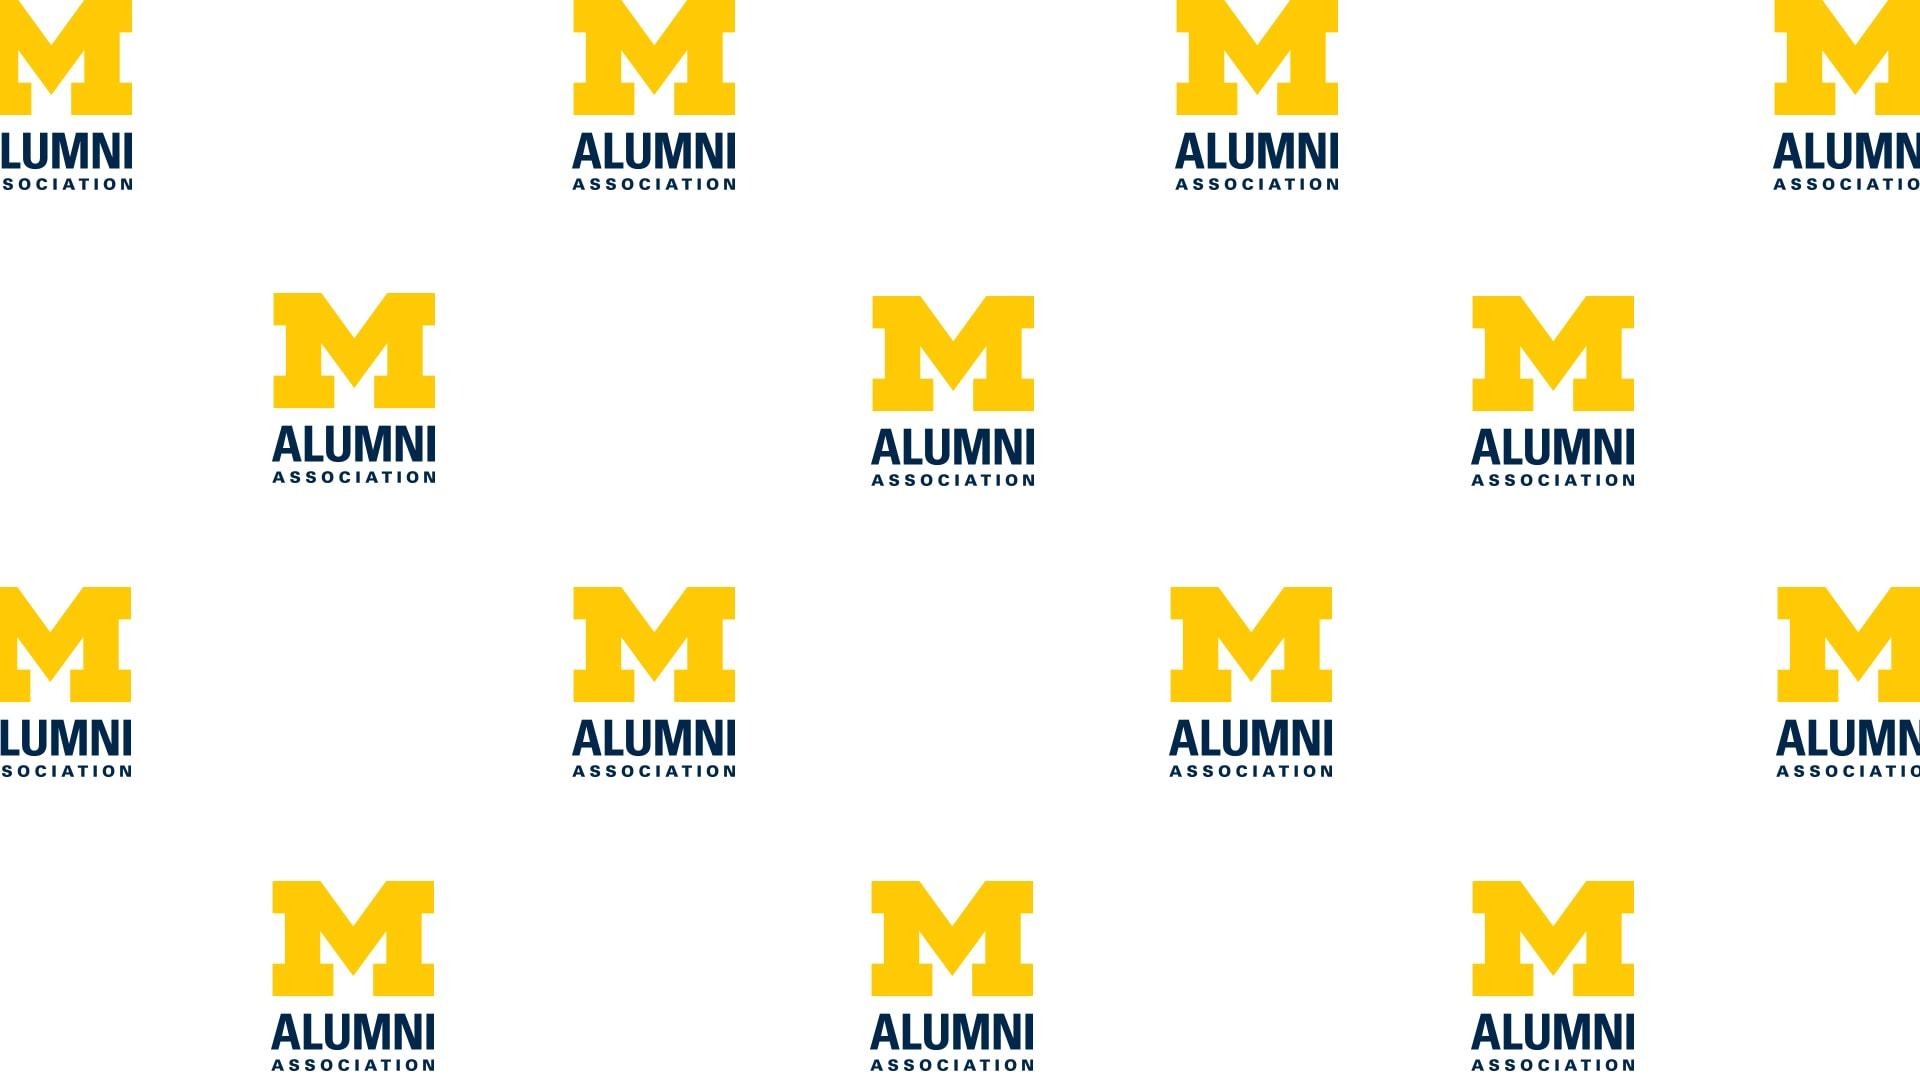 Alumni Association logos